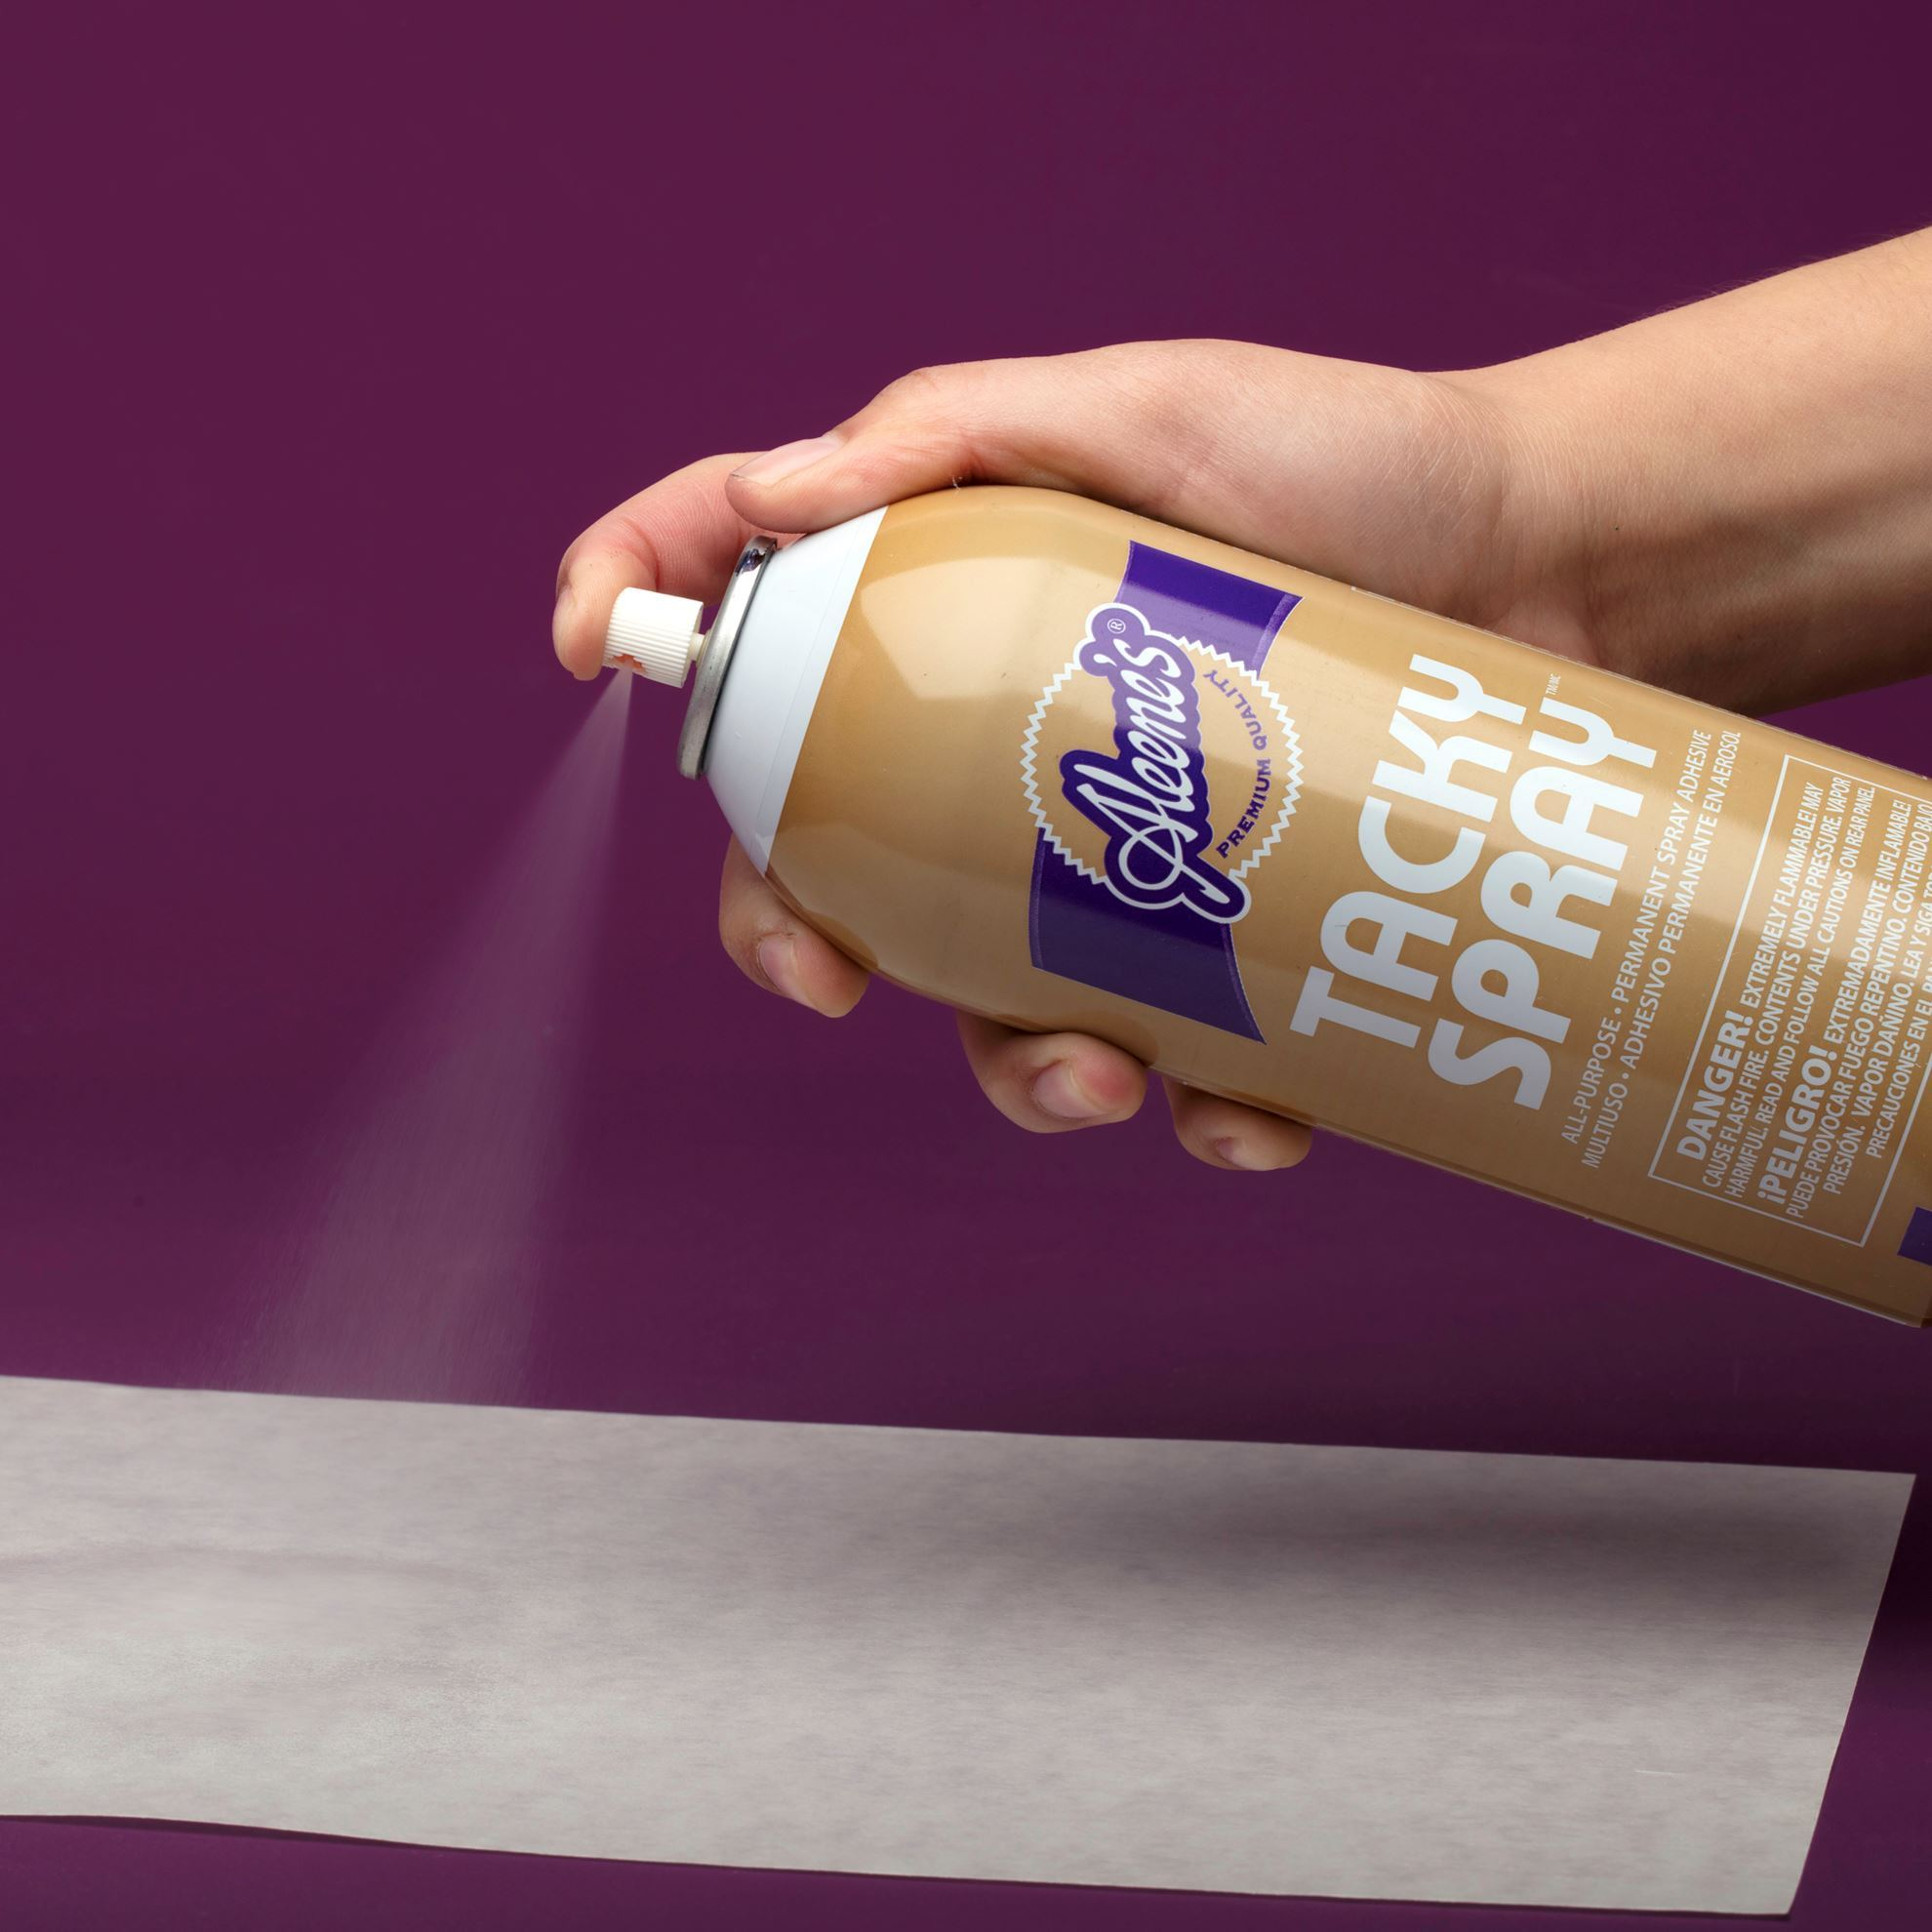 Crystal clear tacky spray - spraying